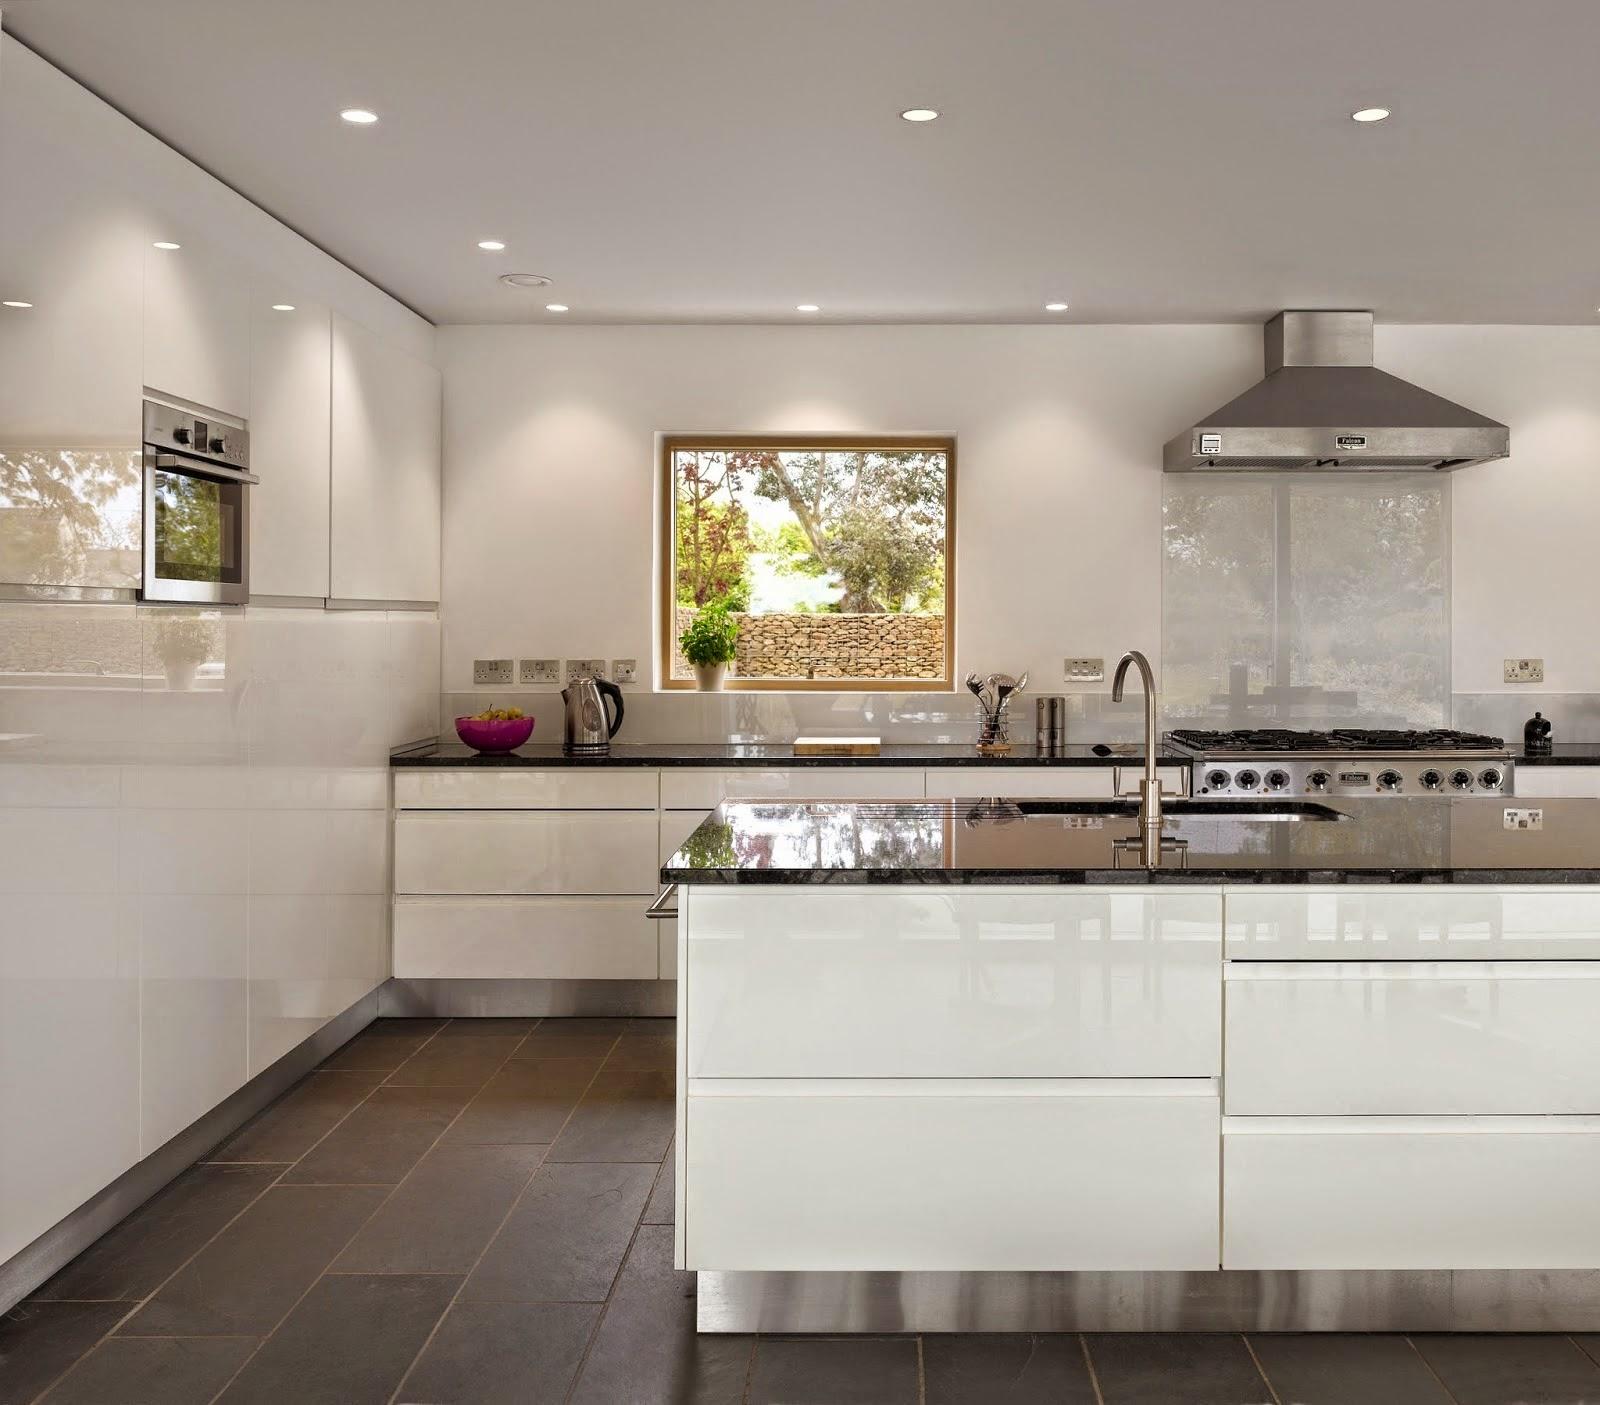 Contoh Ruang Dapur Minimalis